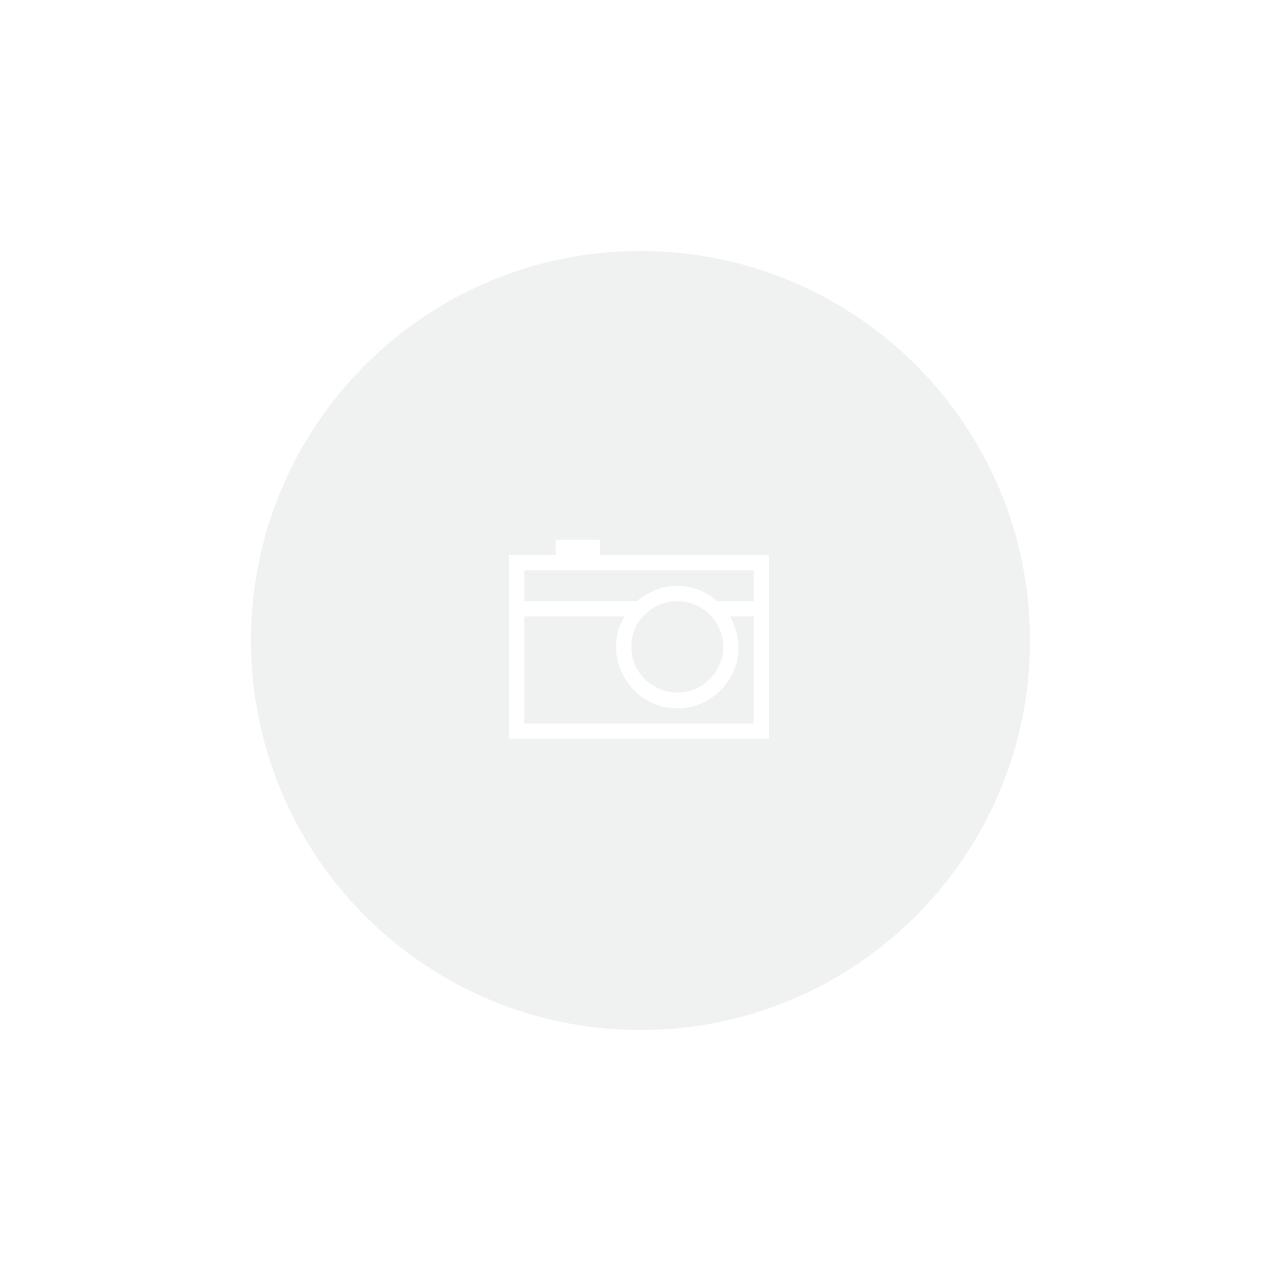 PLACA DE VIDEO GIGABYTE GTX1060 G1 GAMING 6GB, GV-N1060G1 GAMING-6GB